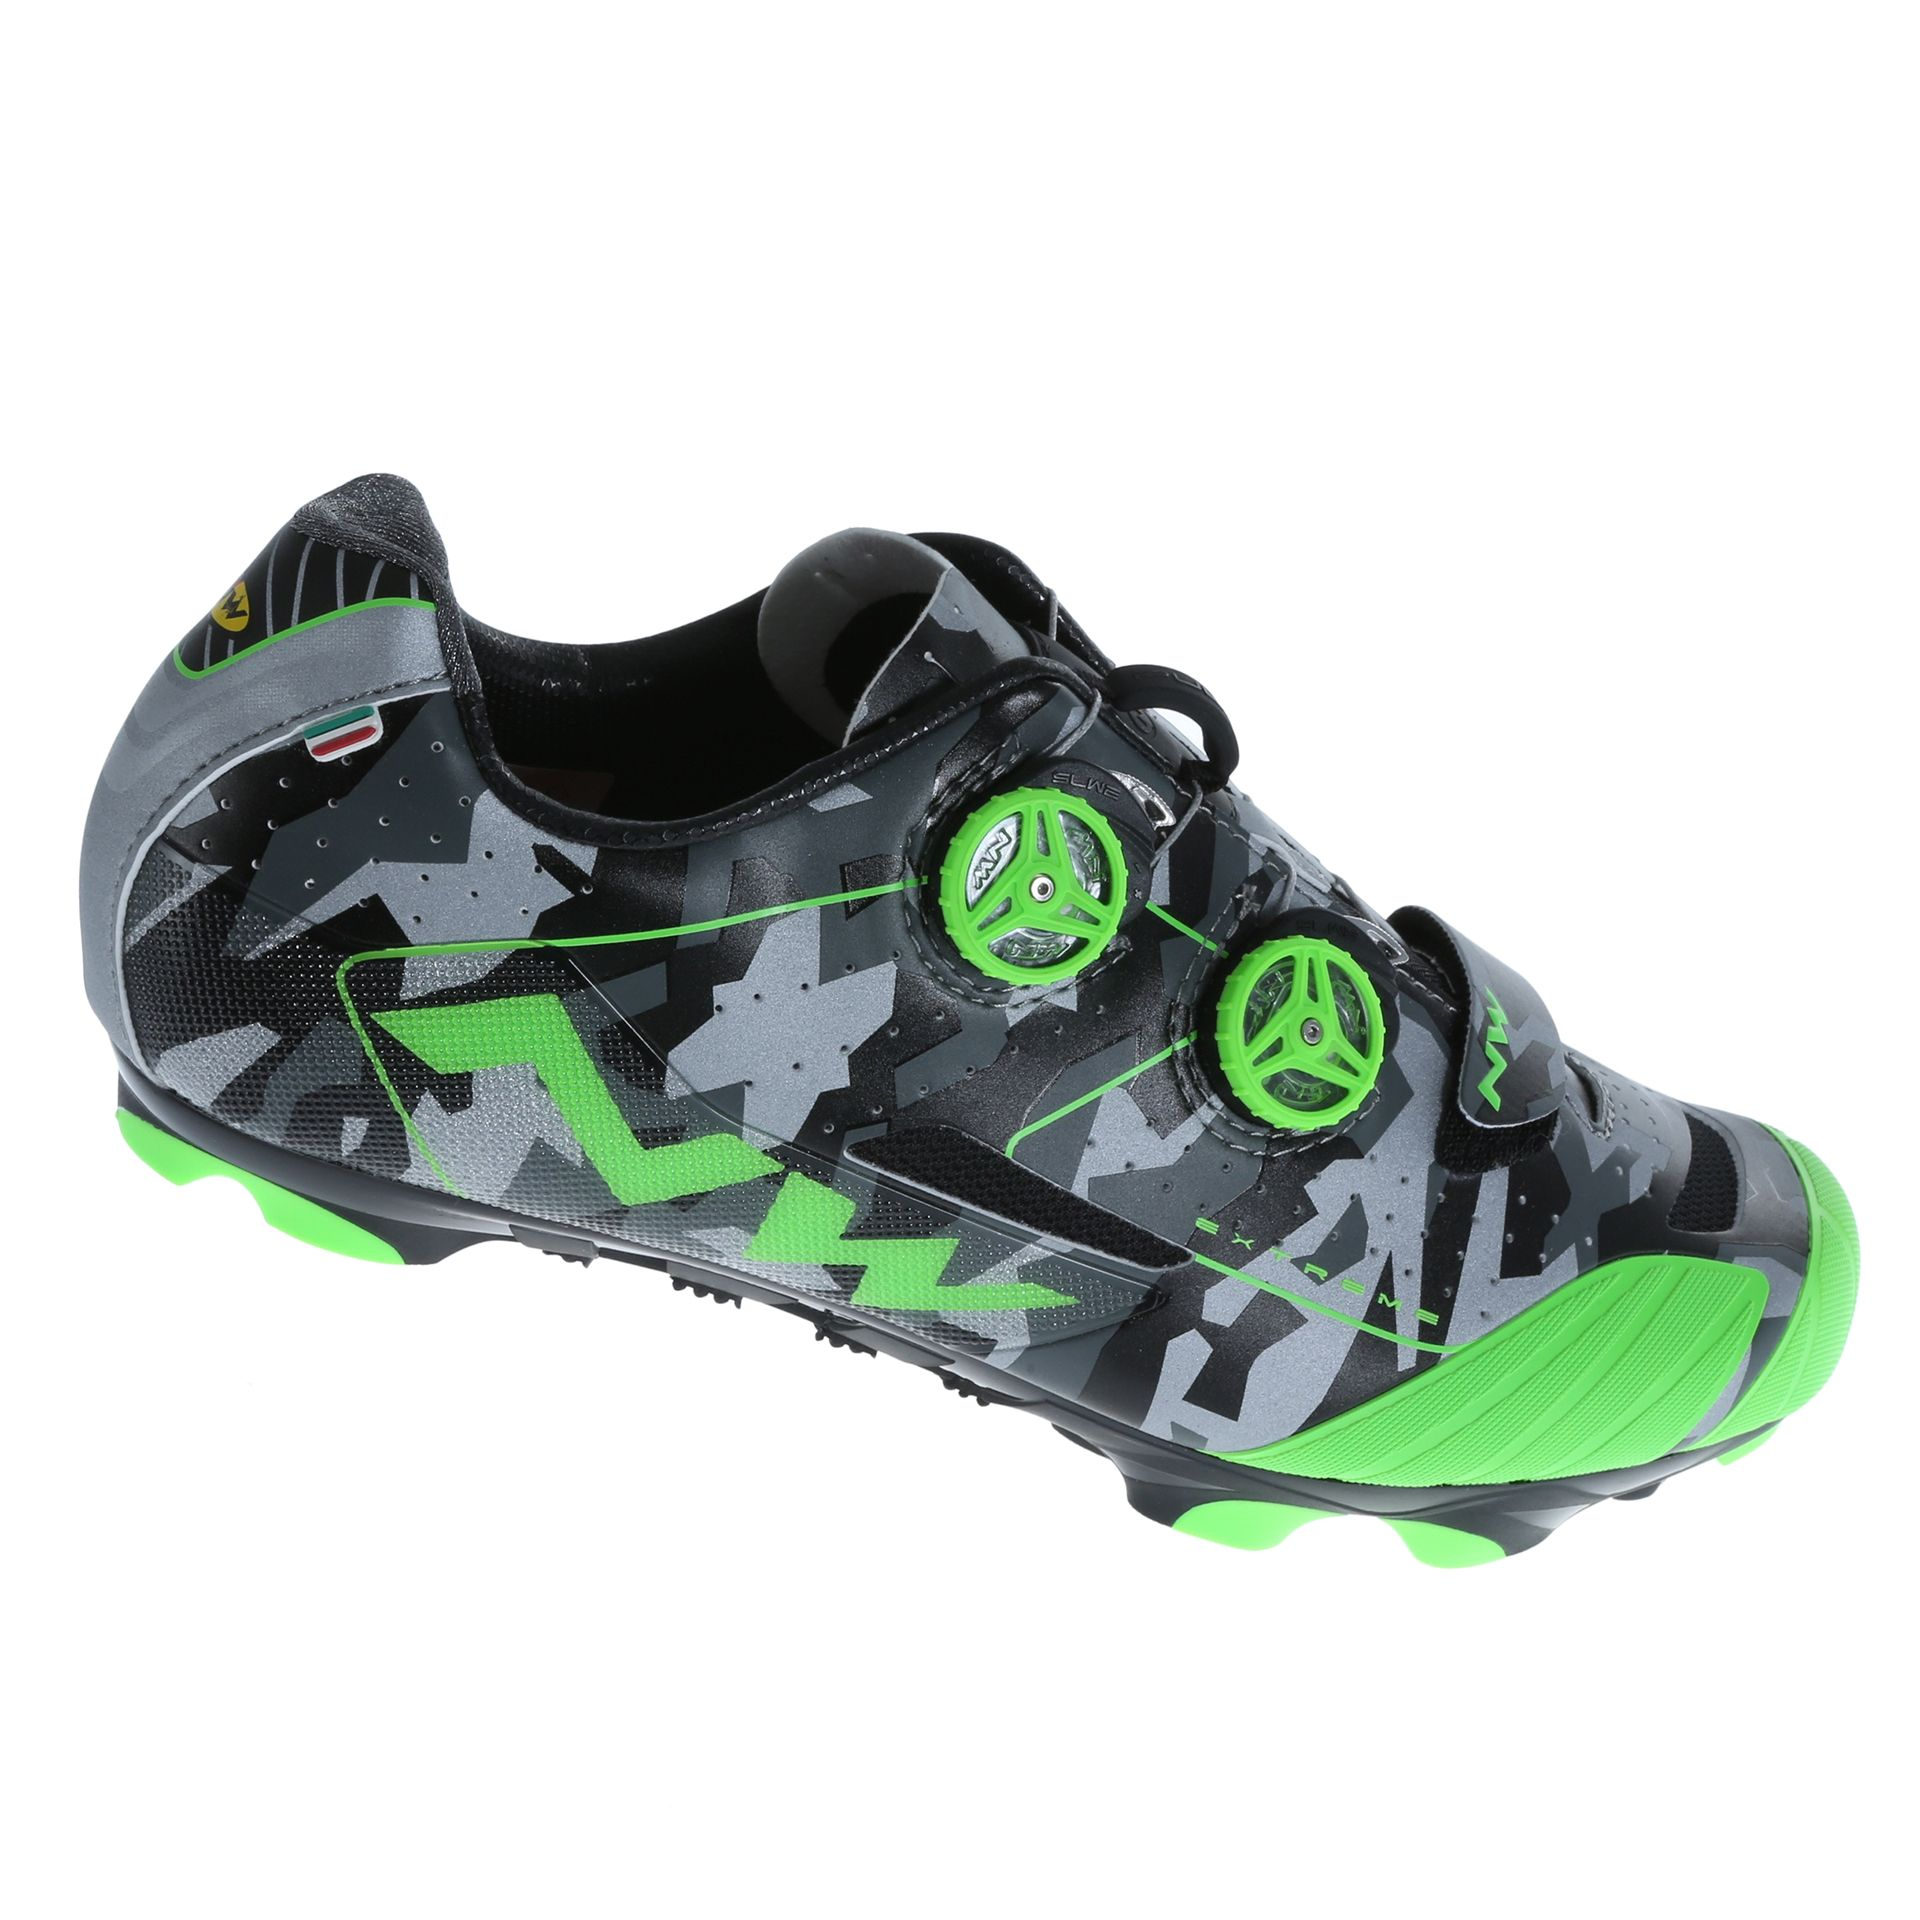 Chaussures Northwave Extreme XCM Camo réfléchissant/Vert Fluo - 40,5